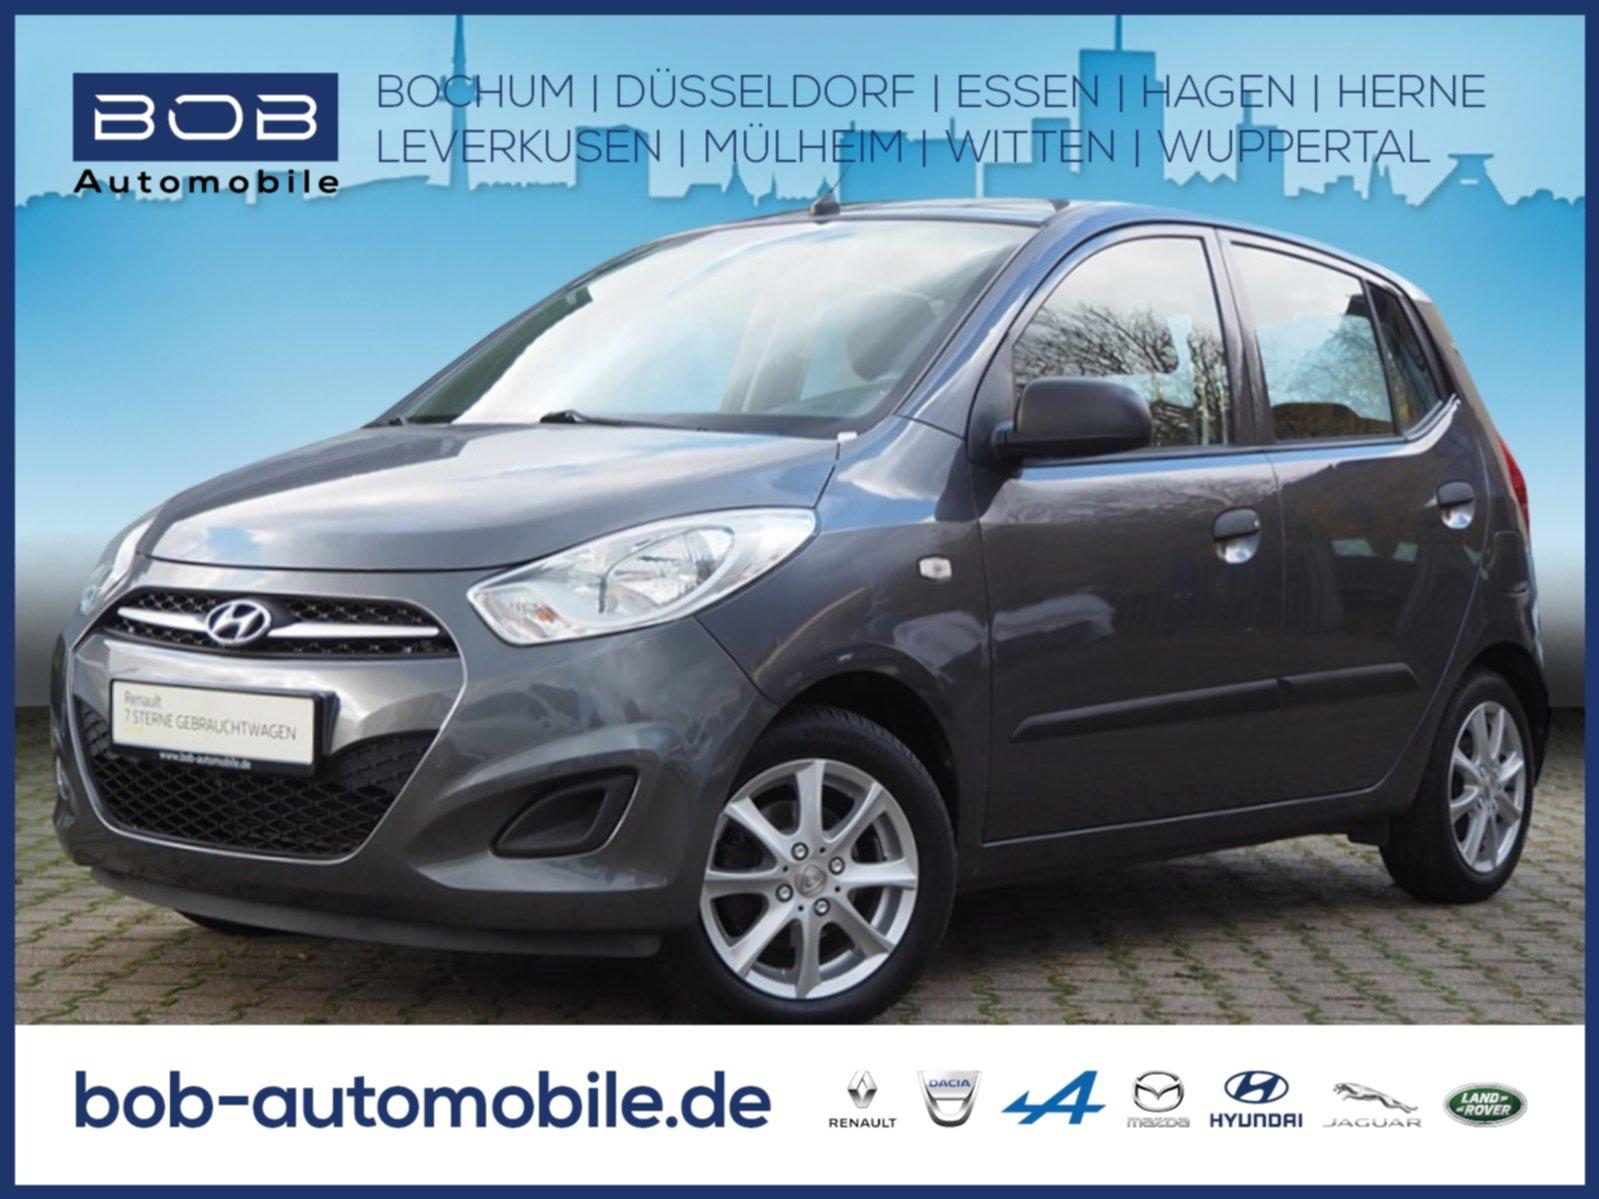 Hyundai i10 5 Star Edition KLIMA ZV SERVO eFH ABS ALU, Jahr 2013, Benzin